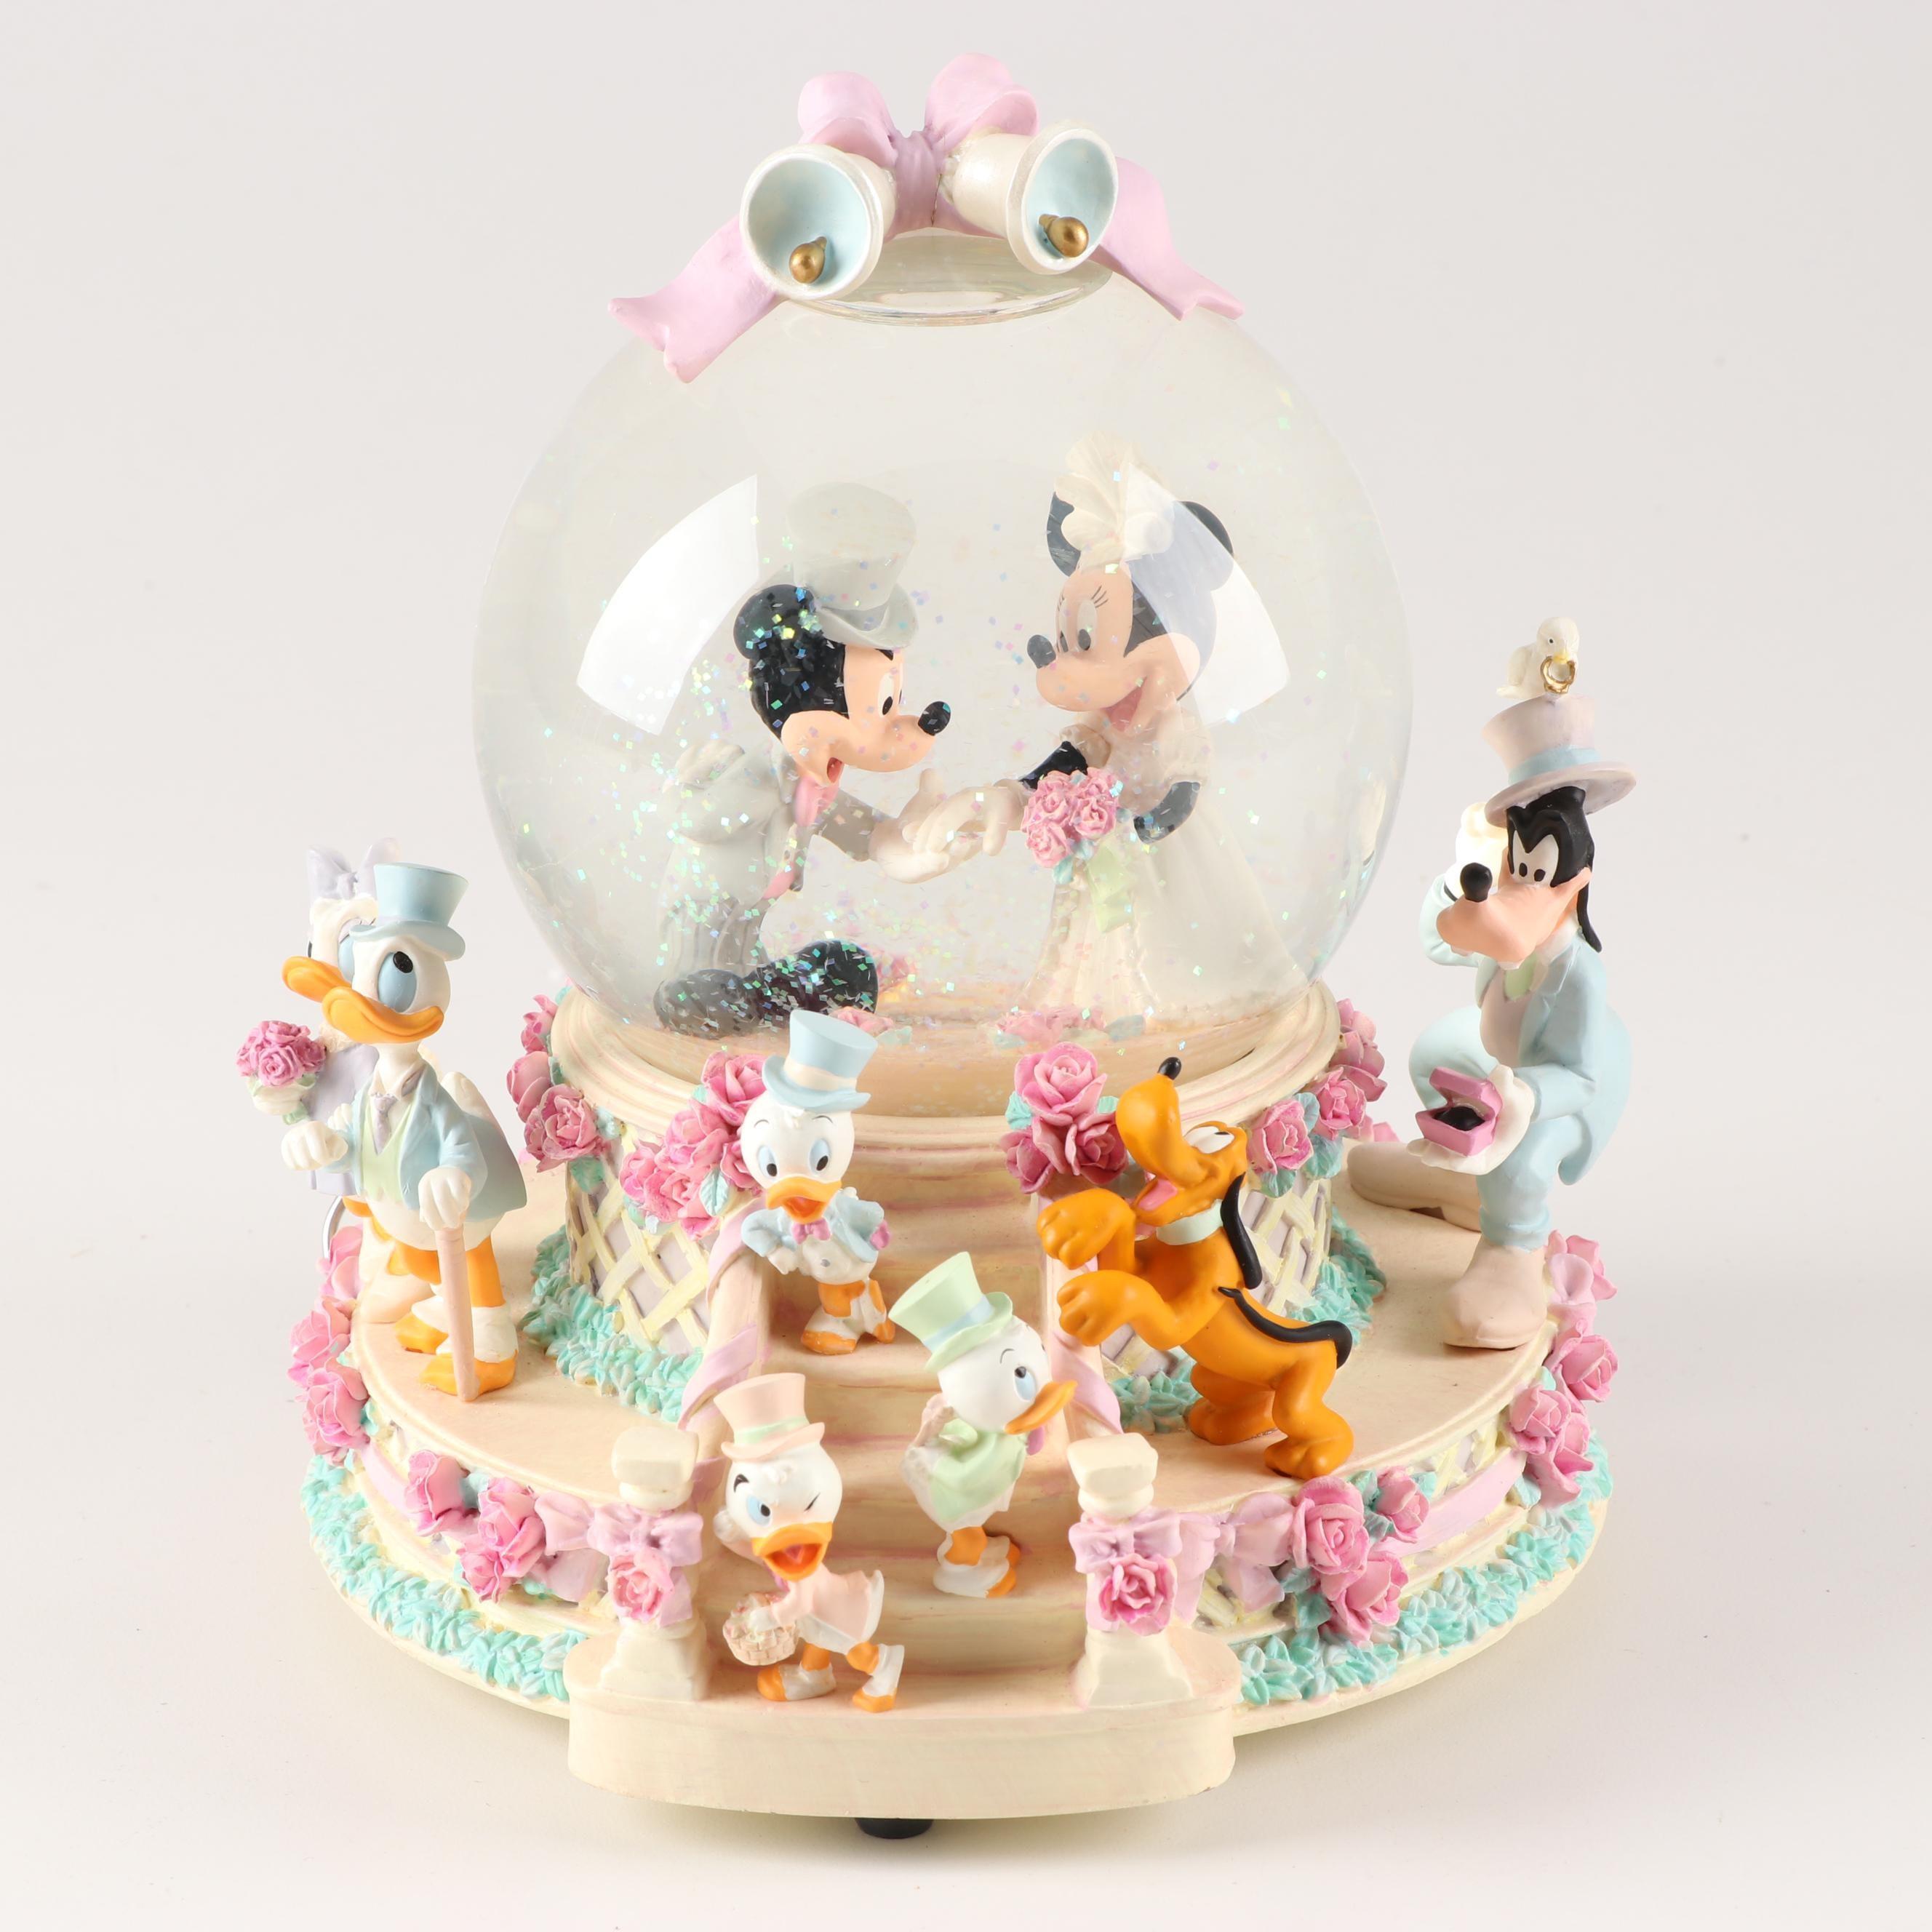 "Disney's Mickey and Minnie Snow Globe "" Wedding March"" Music Box"